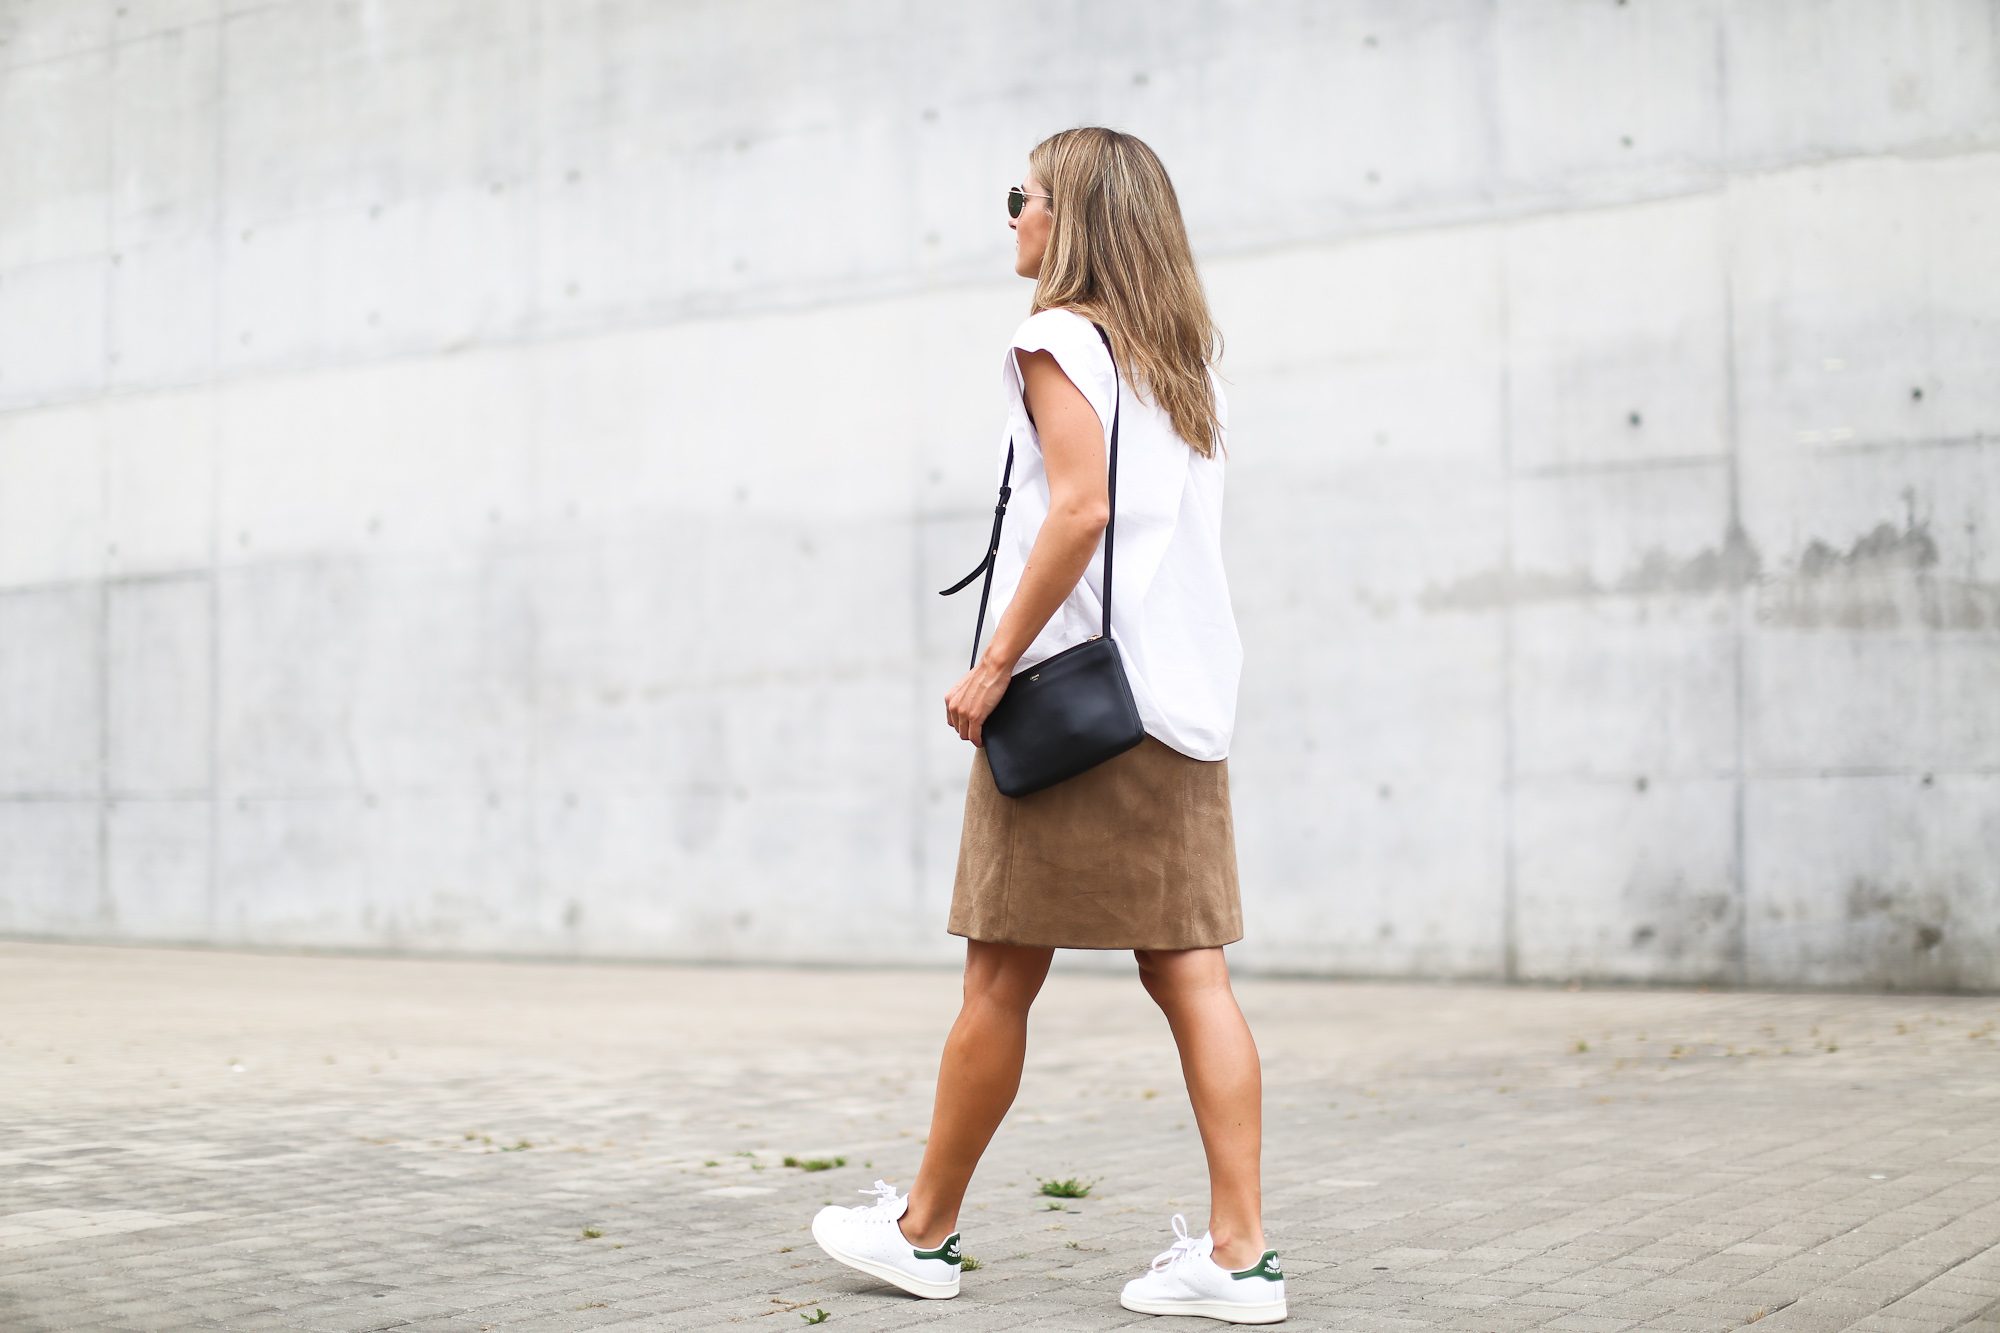 Clochet_suede_skirt_white_shirt_adidas_stan_smith_leztinstreet_celine_trio_bag-2